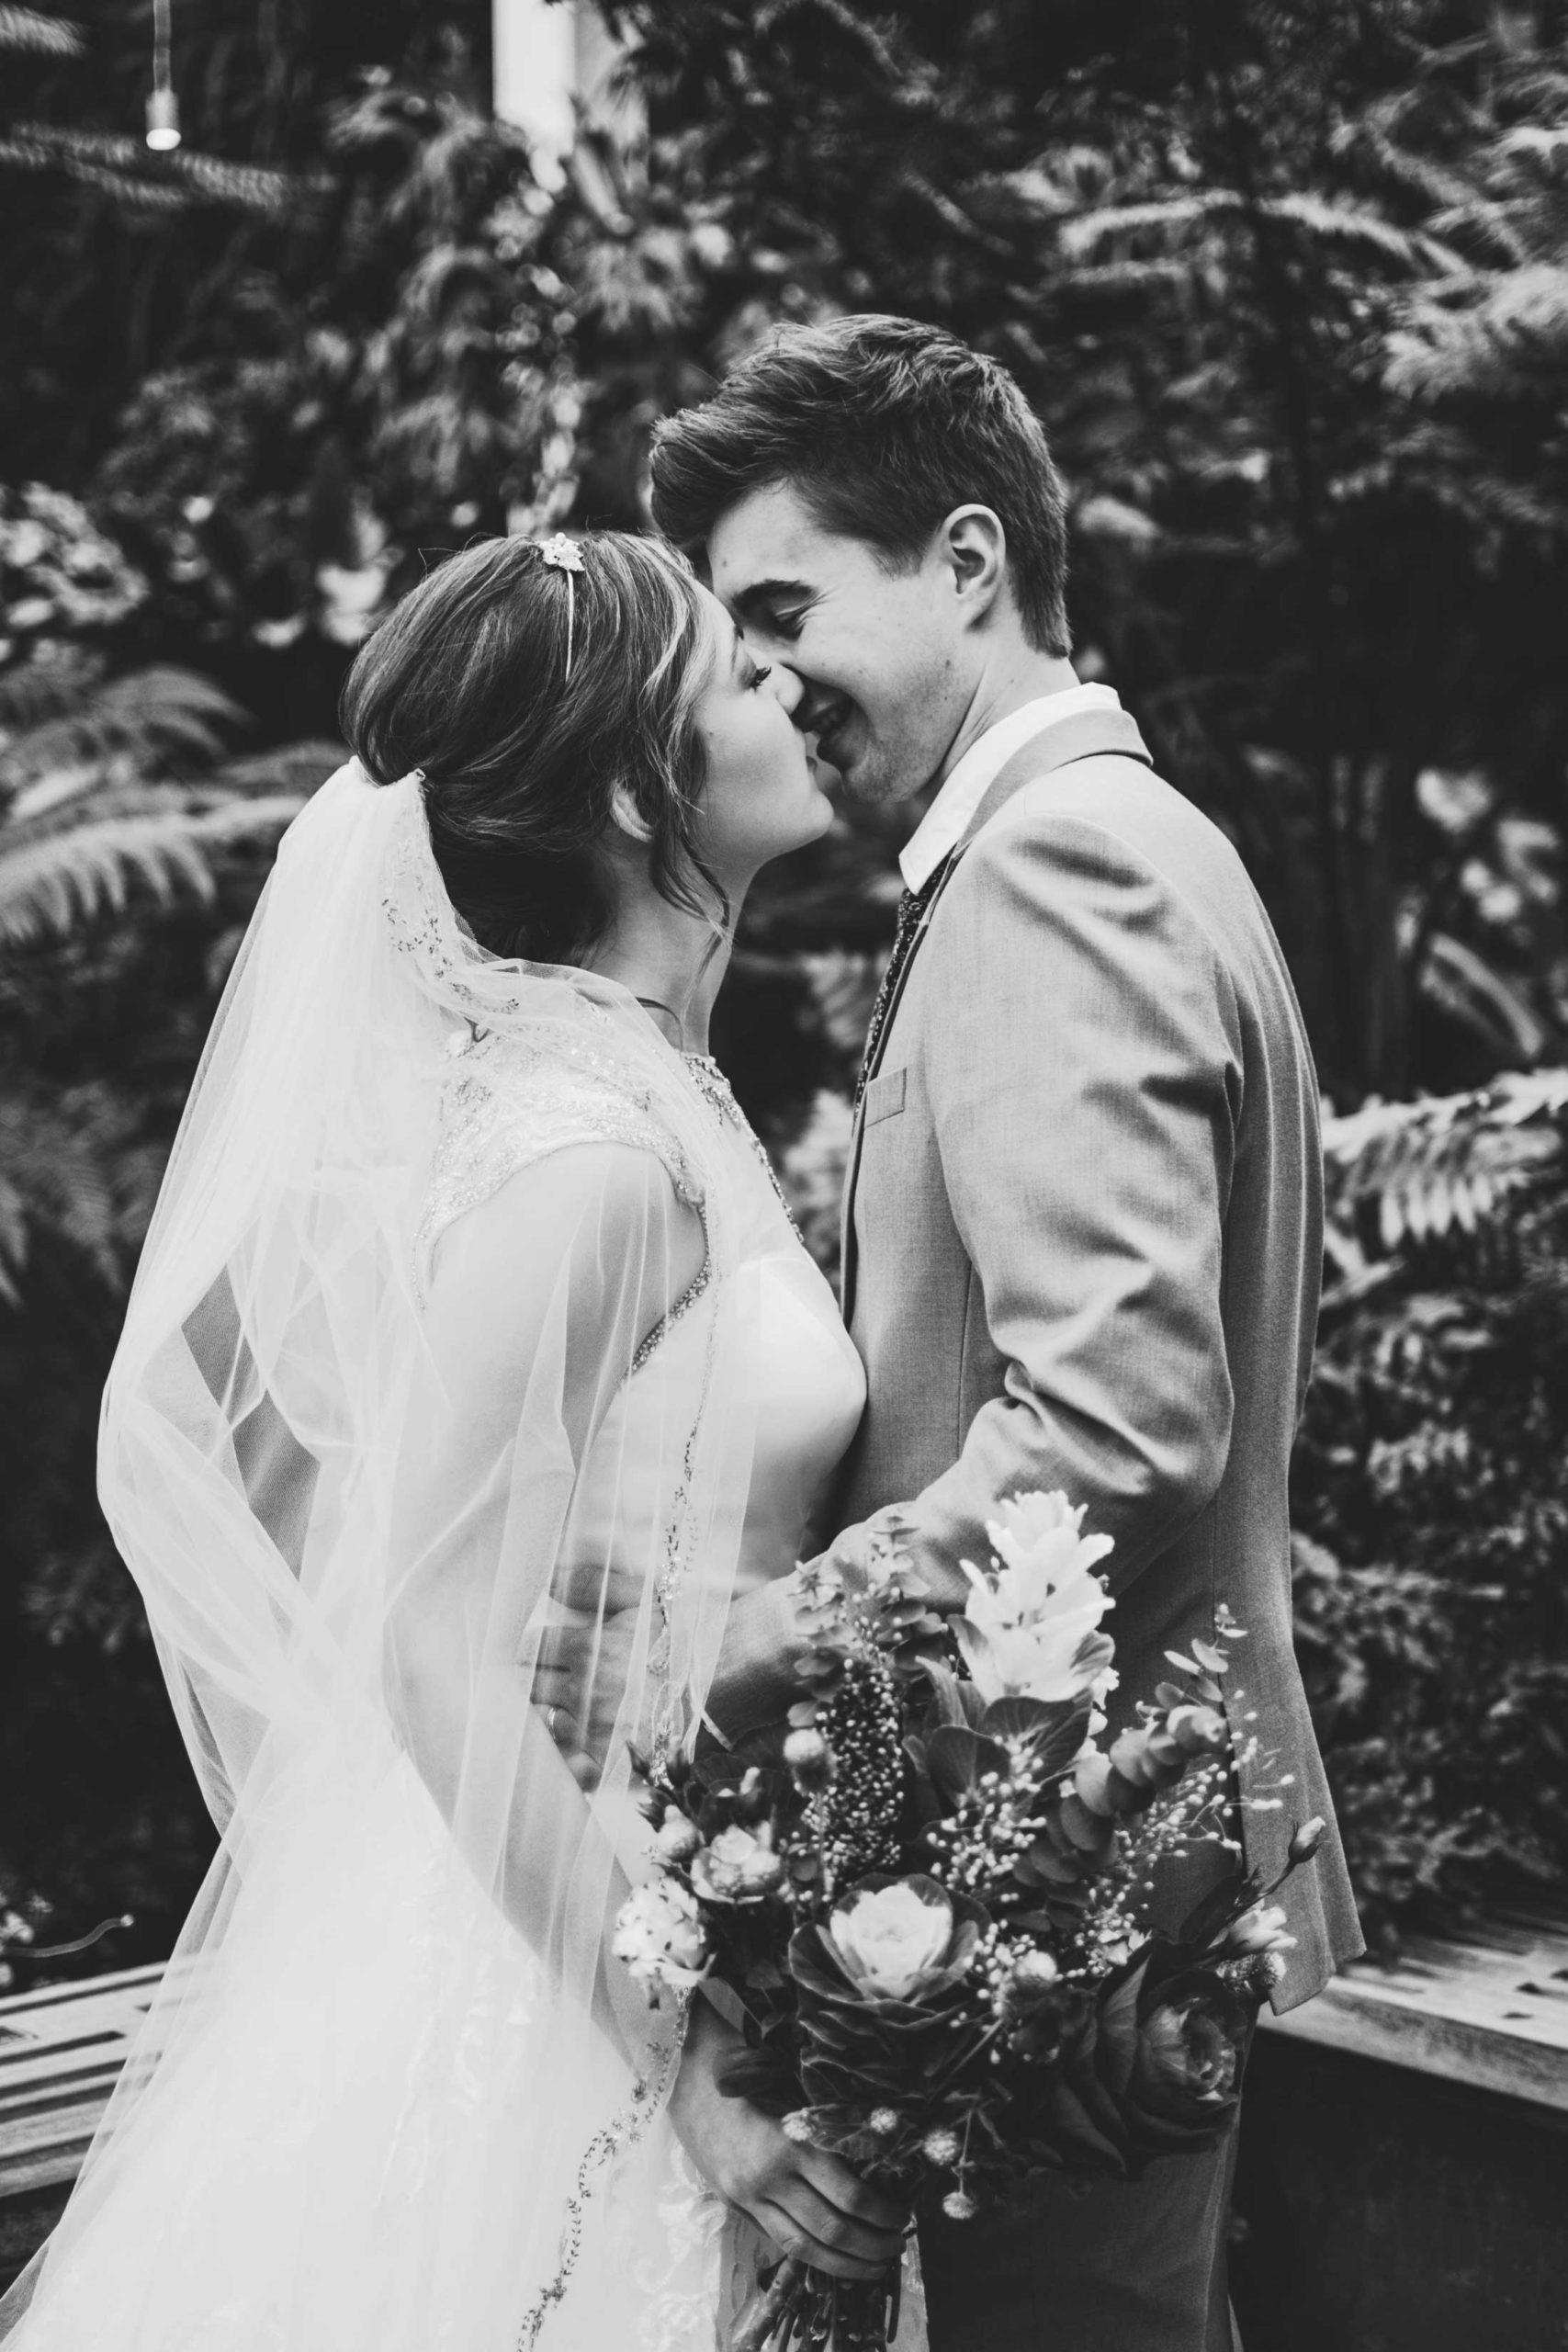 postponing-your-wedding-during-covid-19-12